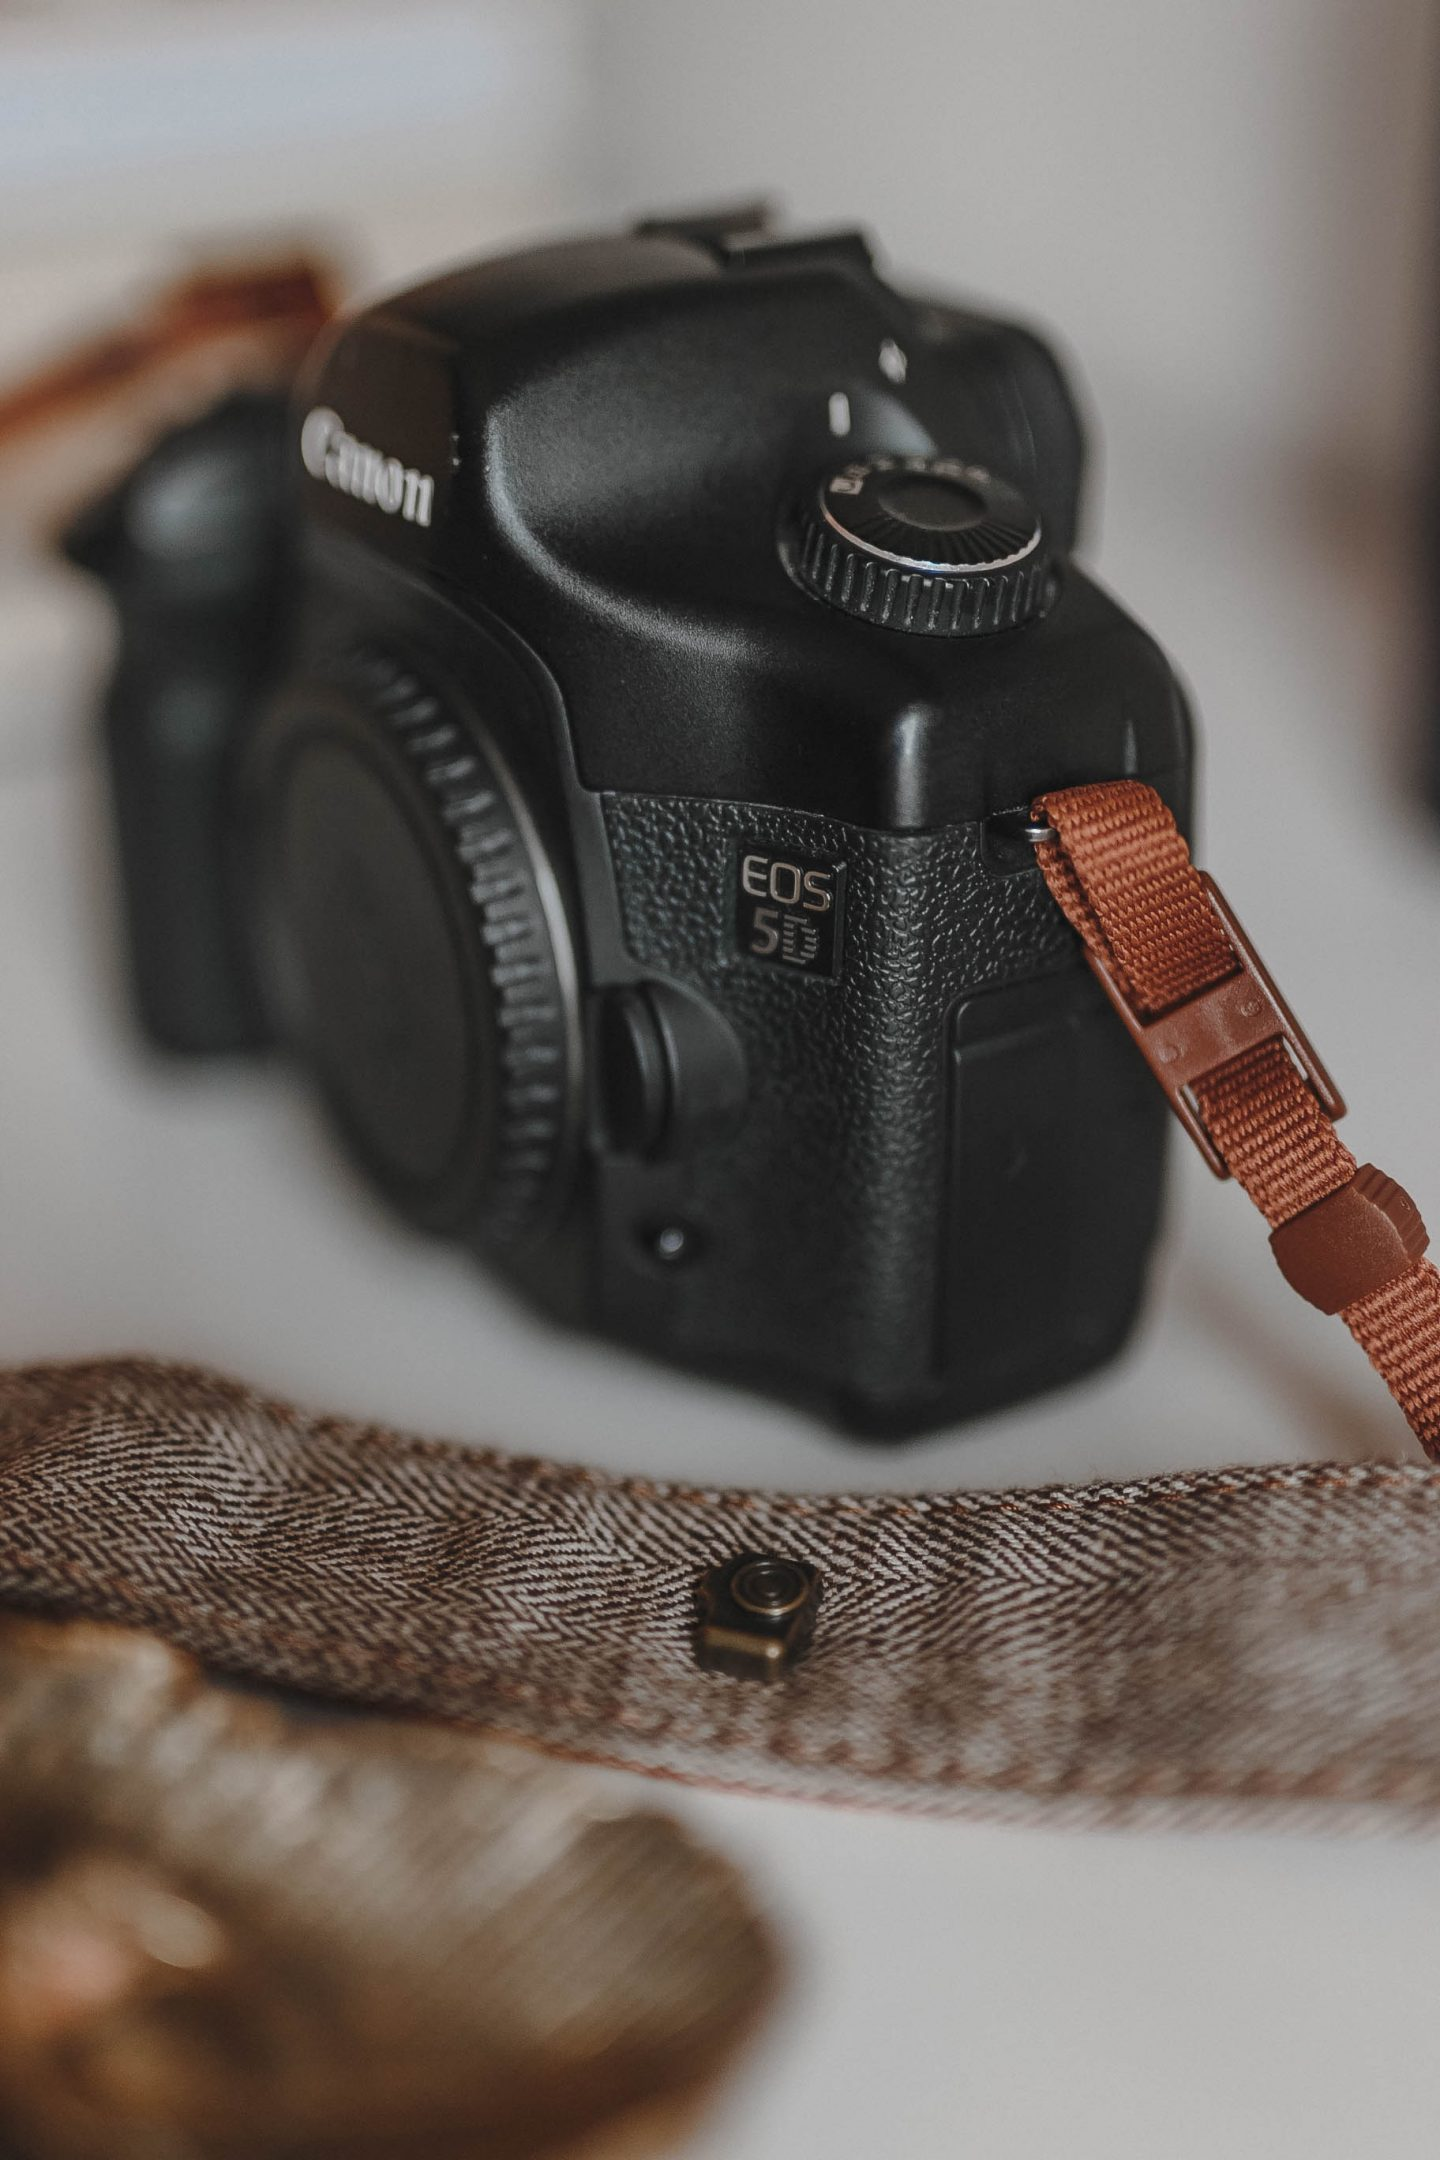 Canon 5D, Canon 5D Mark I, Canon 5D Classic, Old DSLRS, Camera Kit, Blogger Cameras,